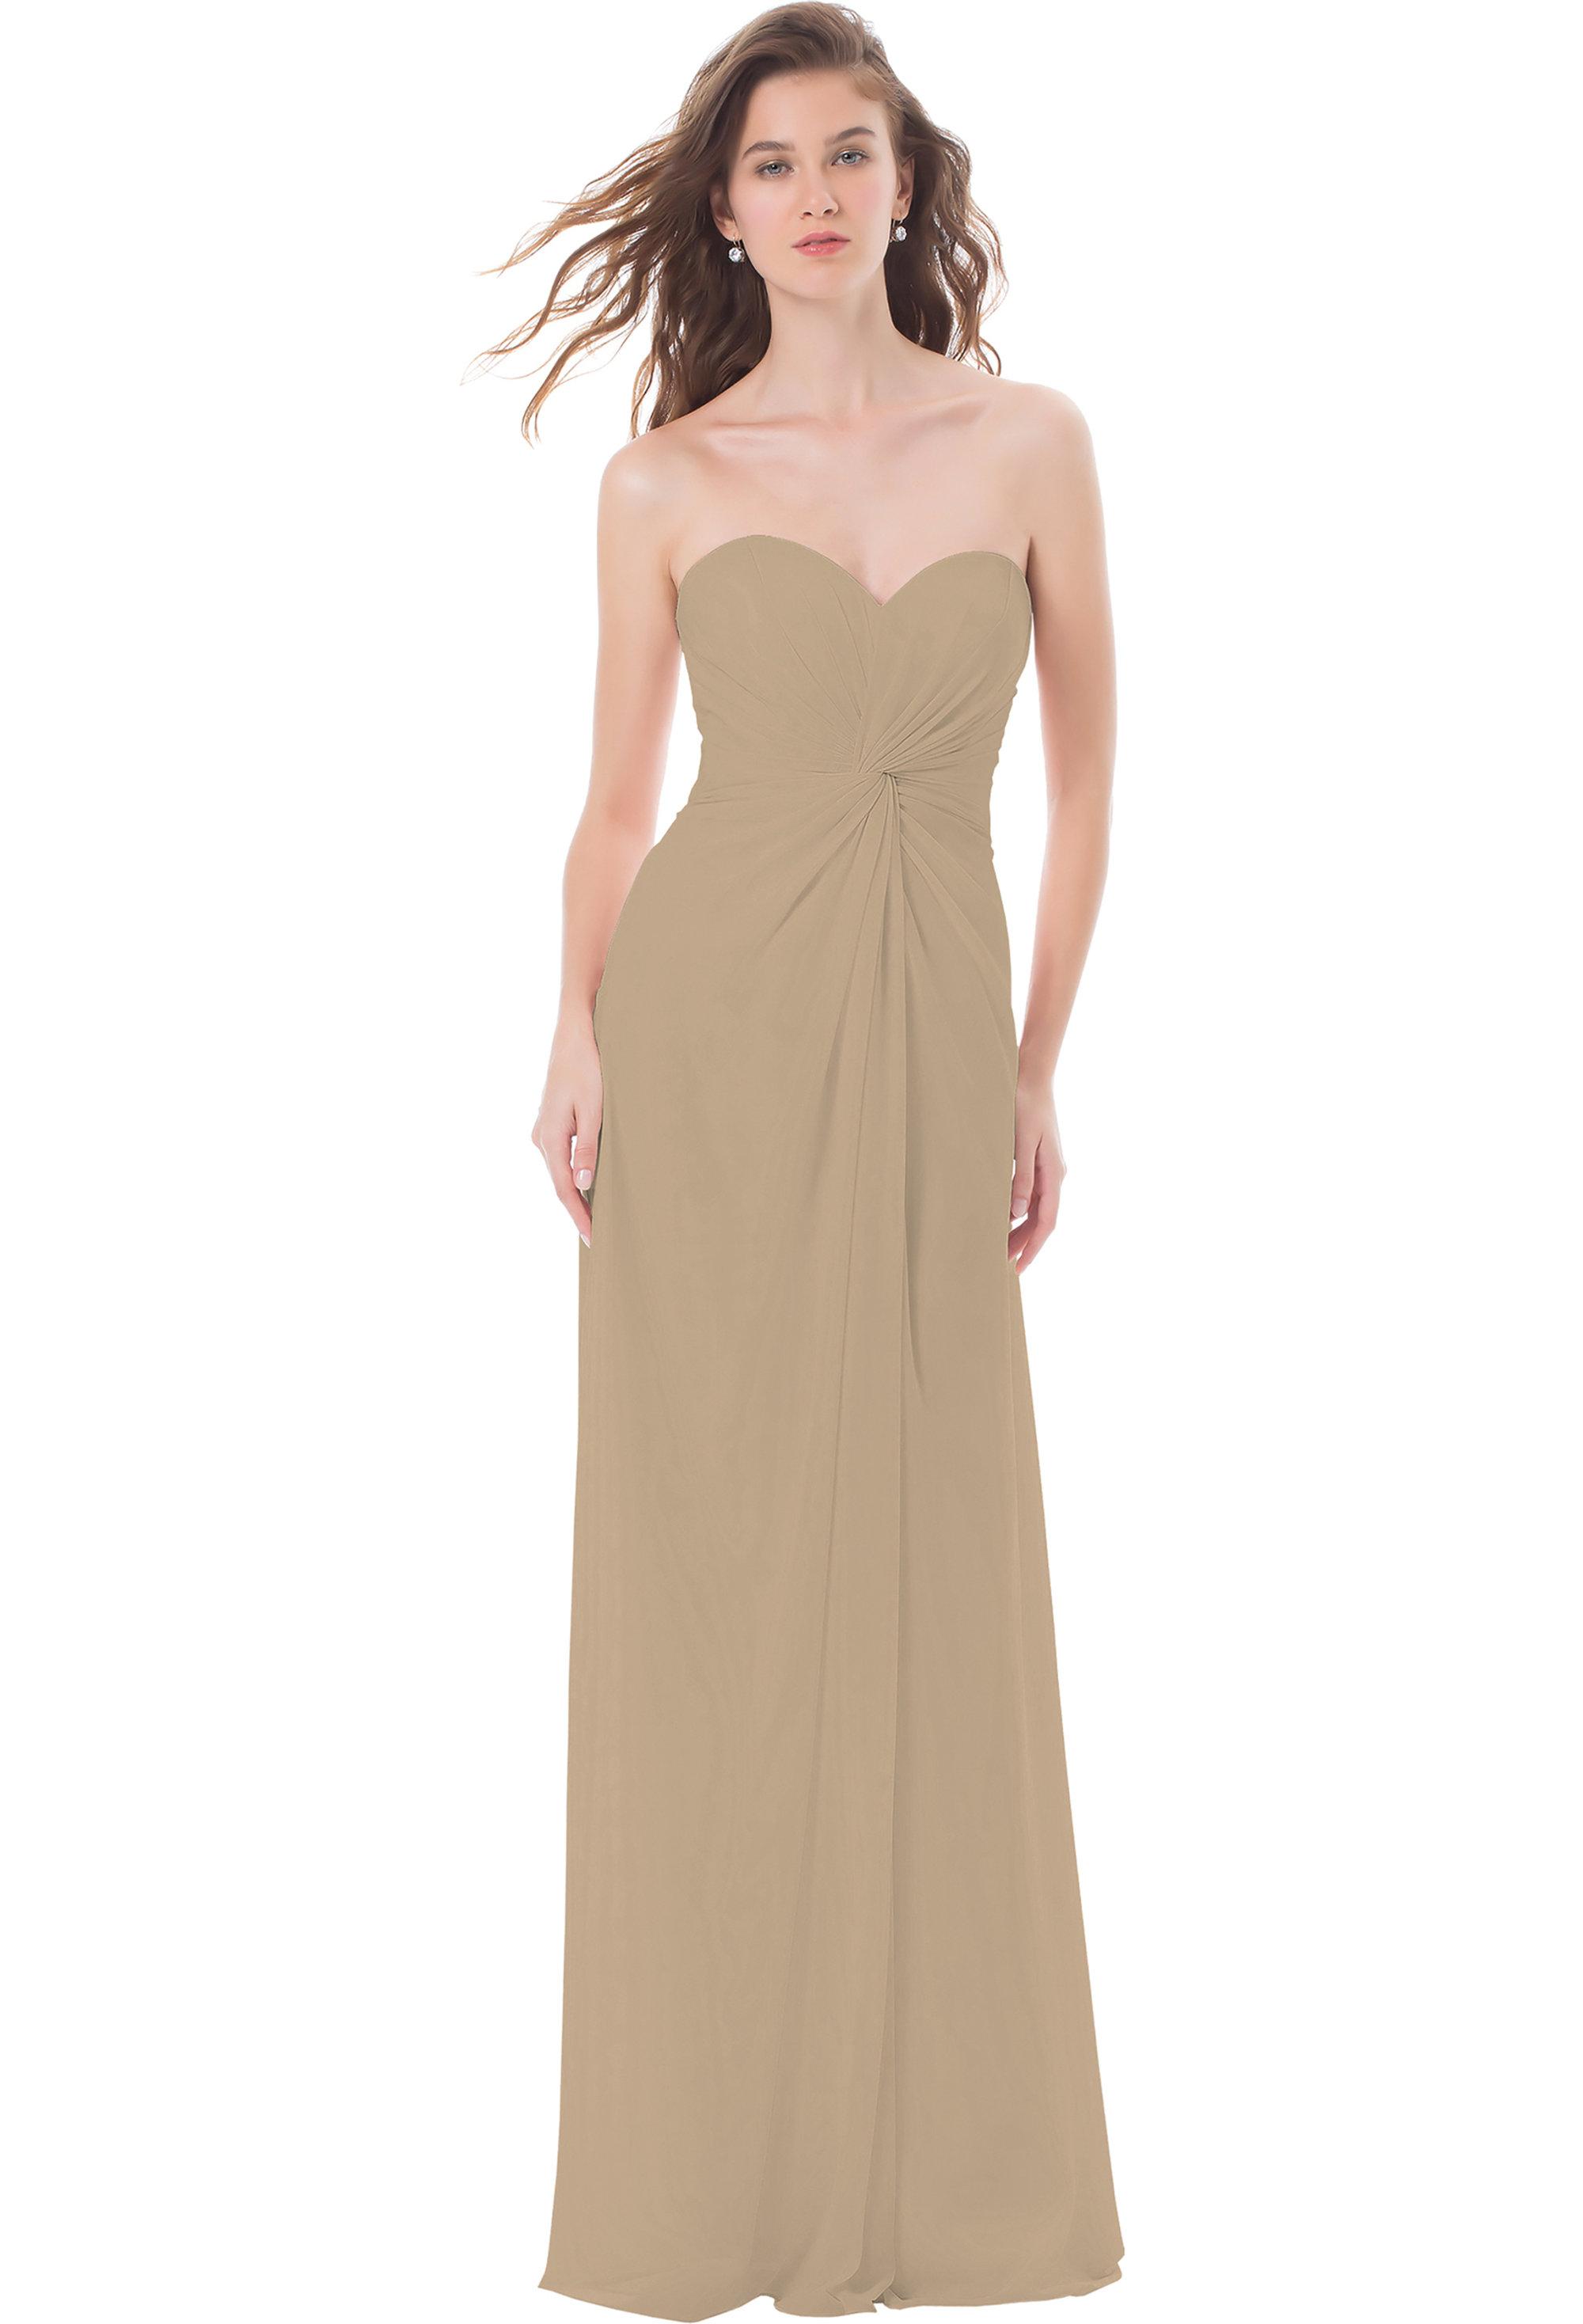 Bill Levkoff CASHMERE Chiffon Sweetheart Asymmetrical gown, $224.00 Front